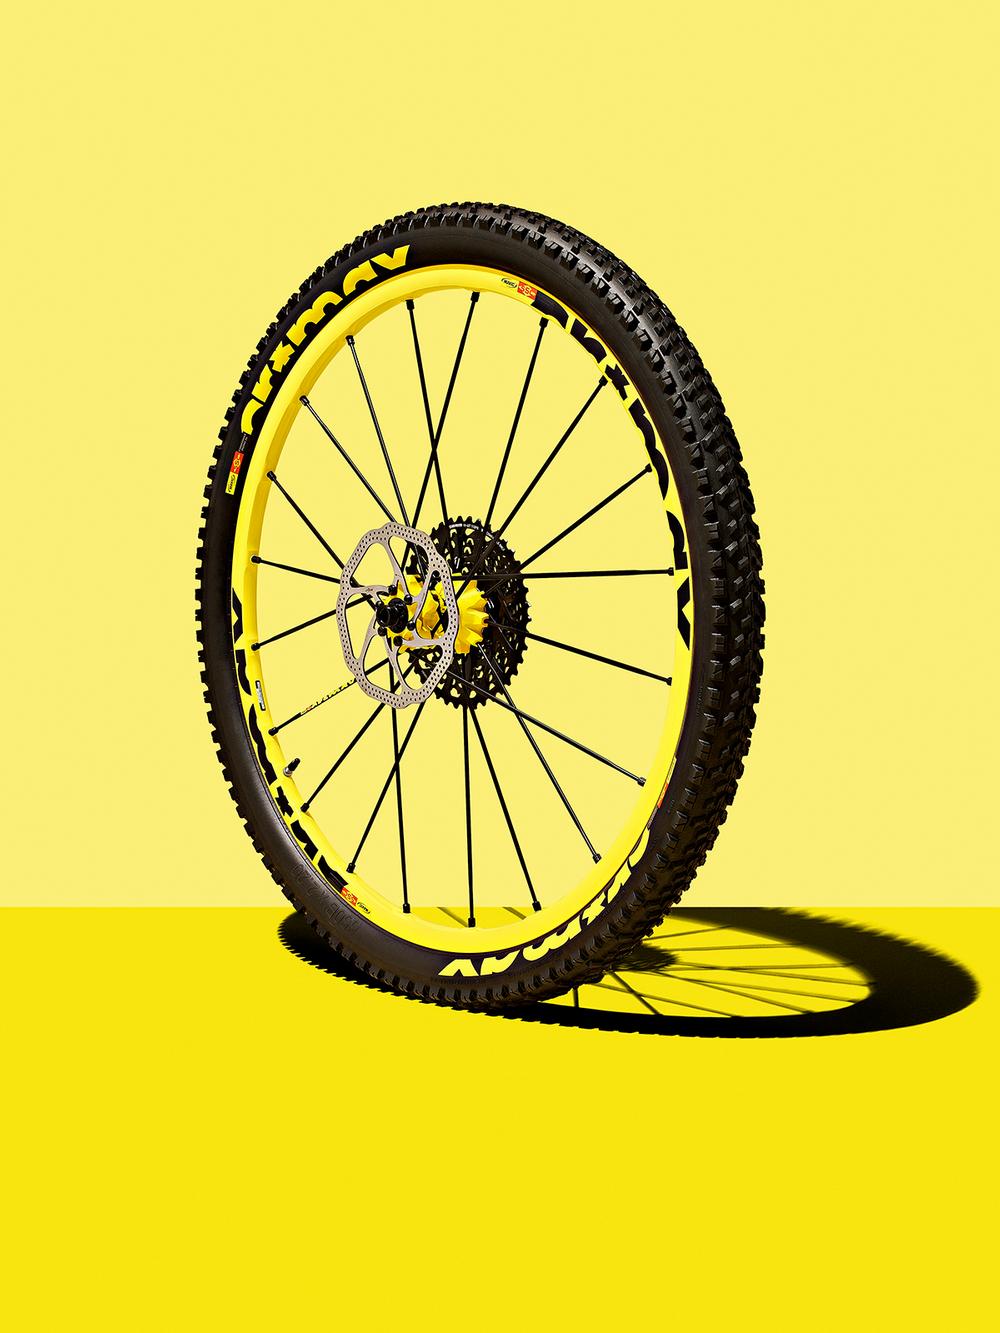 BicyclingTire_Workbook.jpg